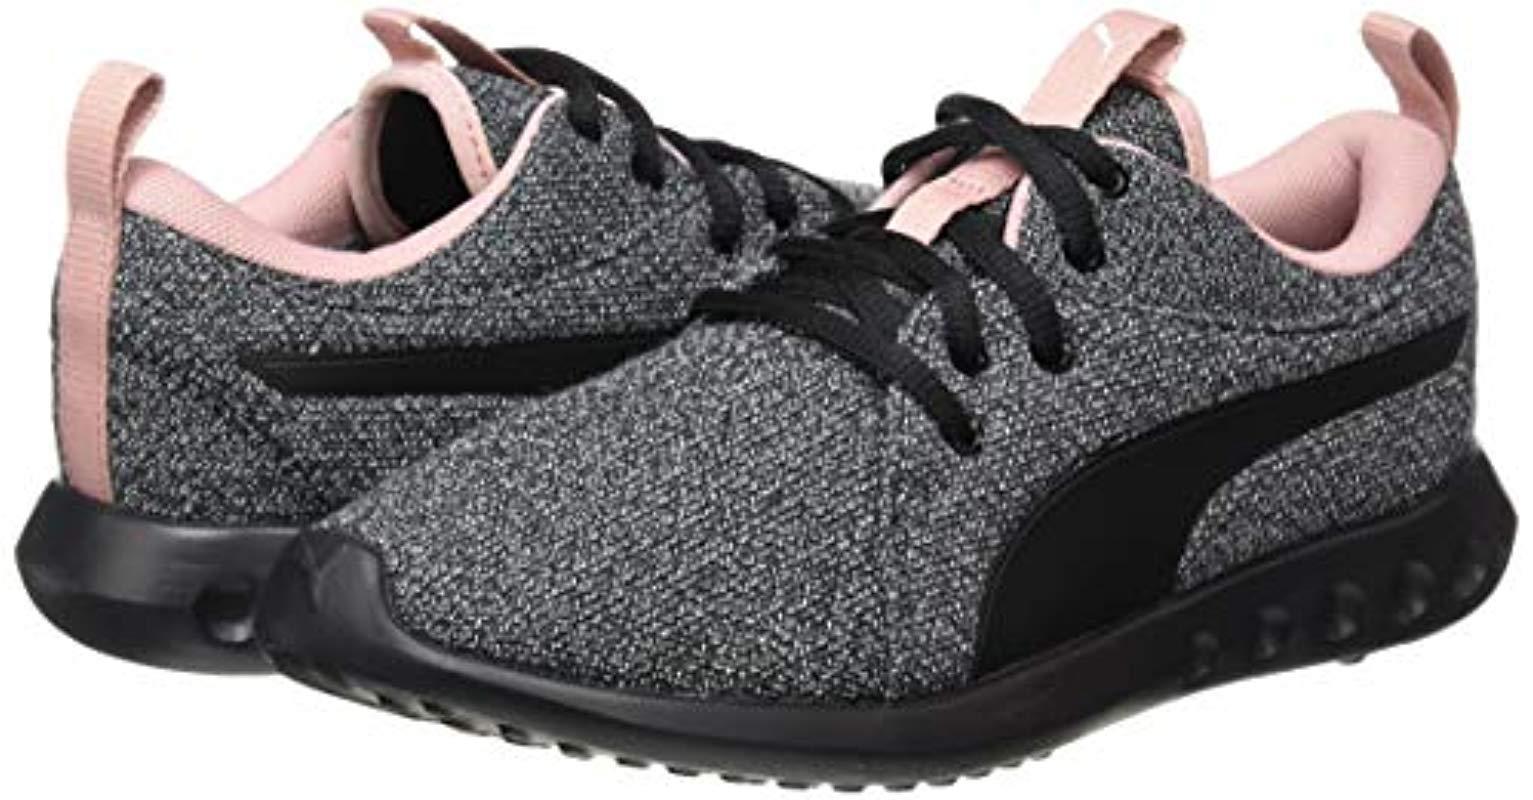 Running Femme PUMA Carson 2 Knit Nm WNS Chaussures Sports et Loisirs